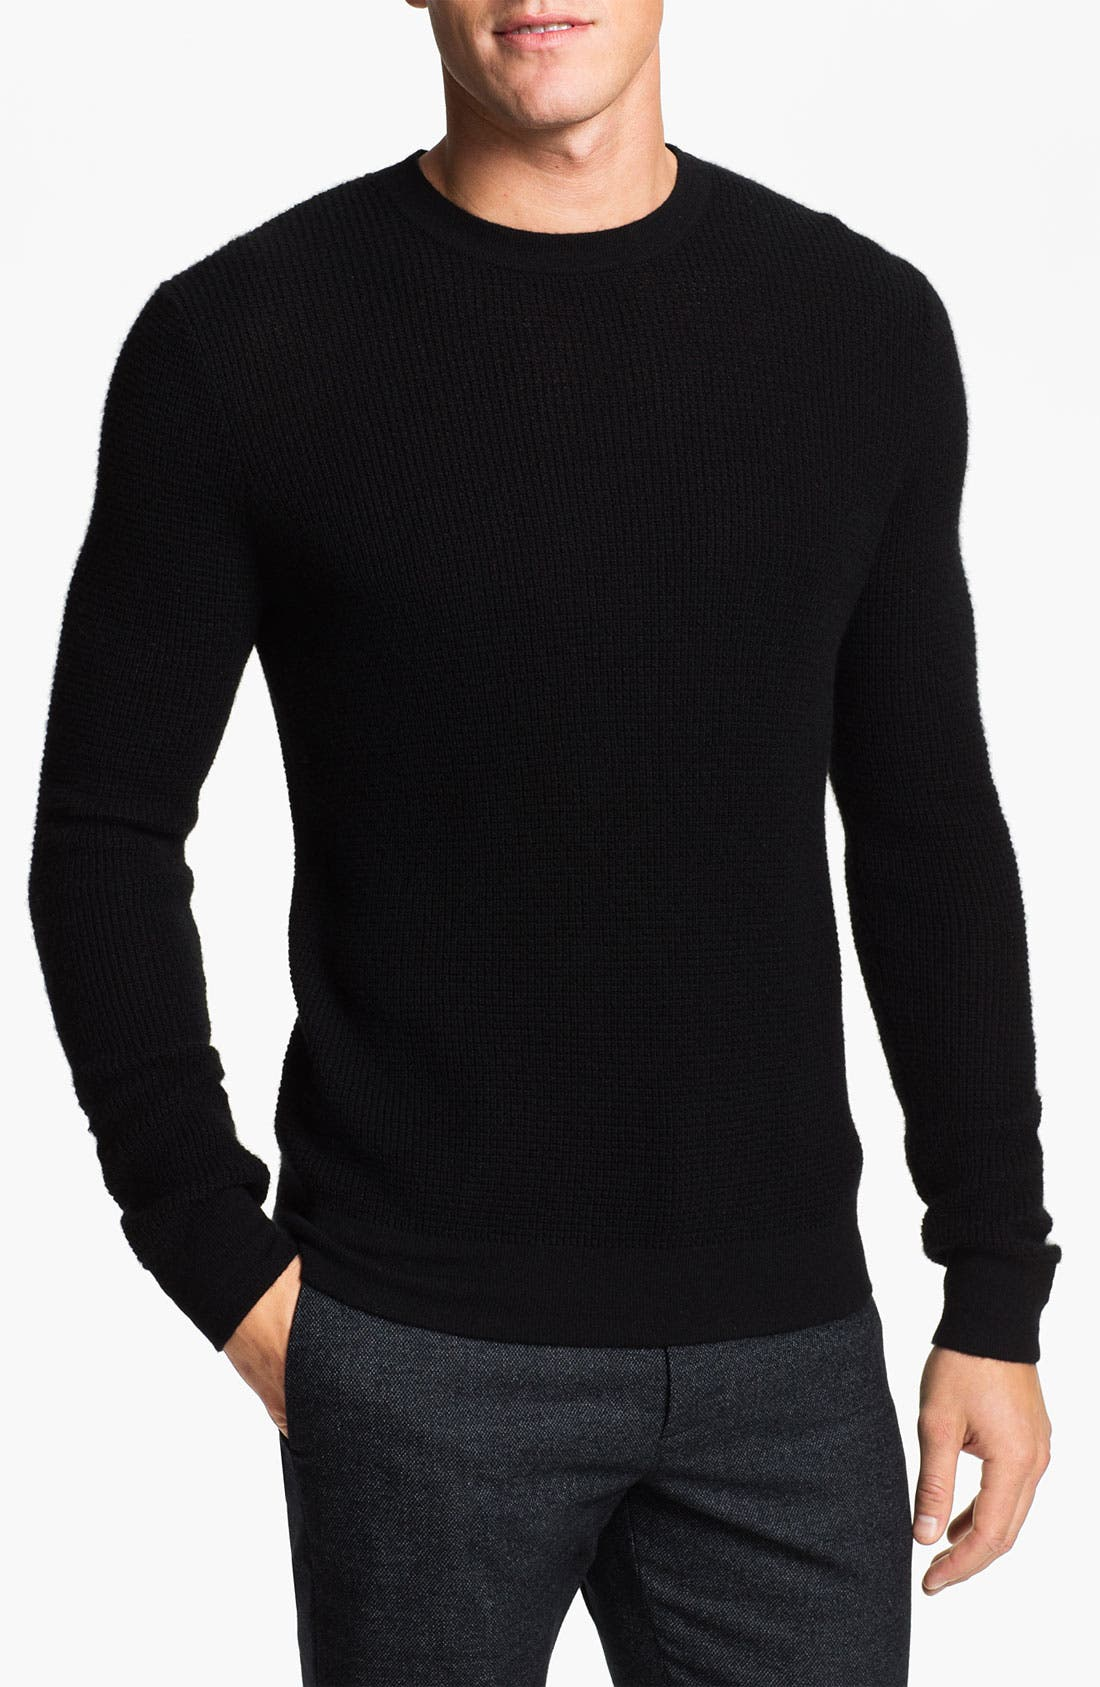 Alternate Image 1 Selected - Theory Waffle Knit Cashmere Crewneck Sweater